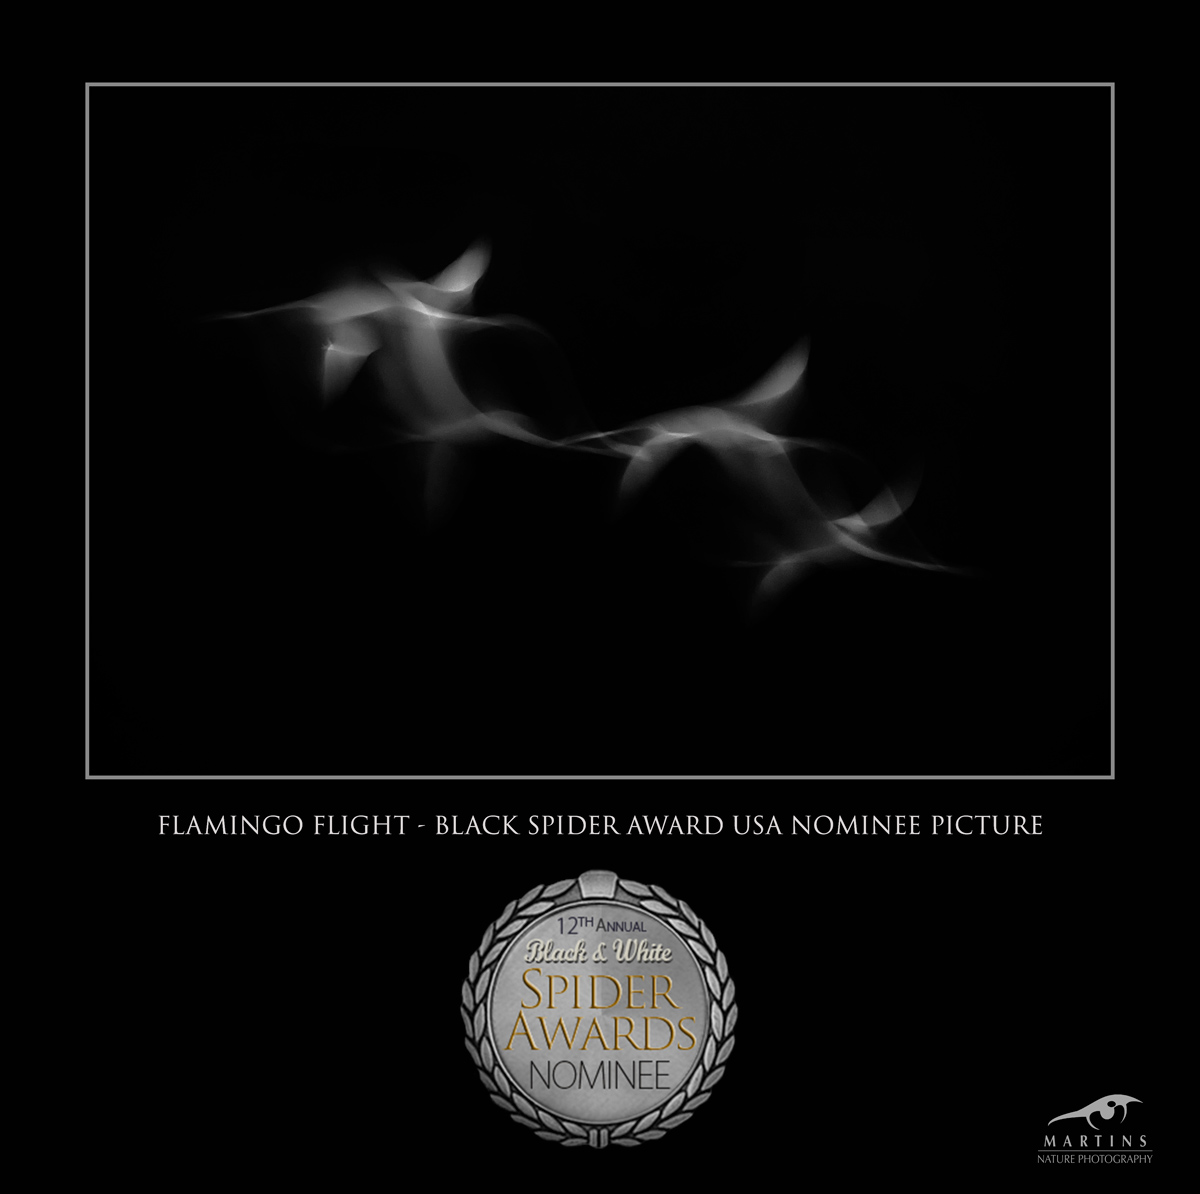 Flamingo-Flight-Martin-Steenhaut-Black-Spider-Awards-2017